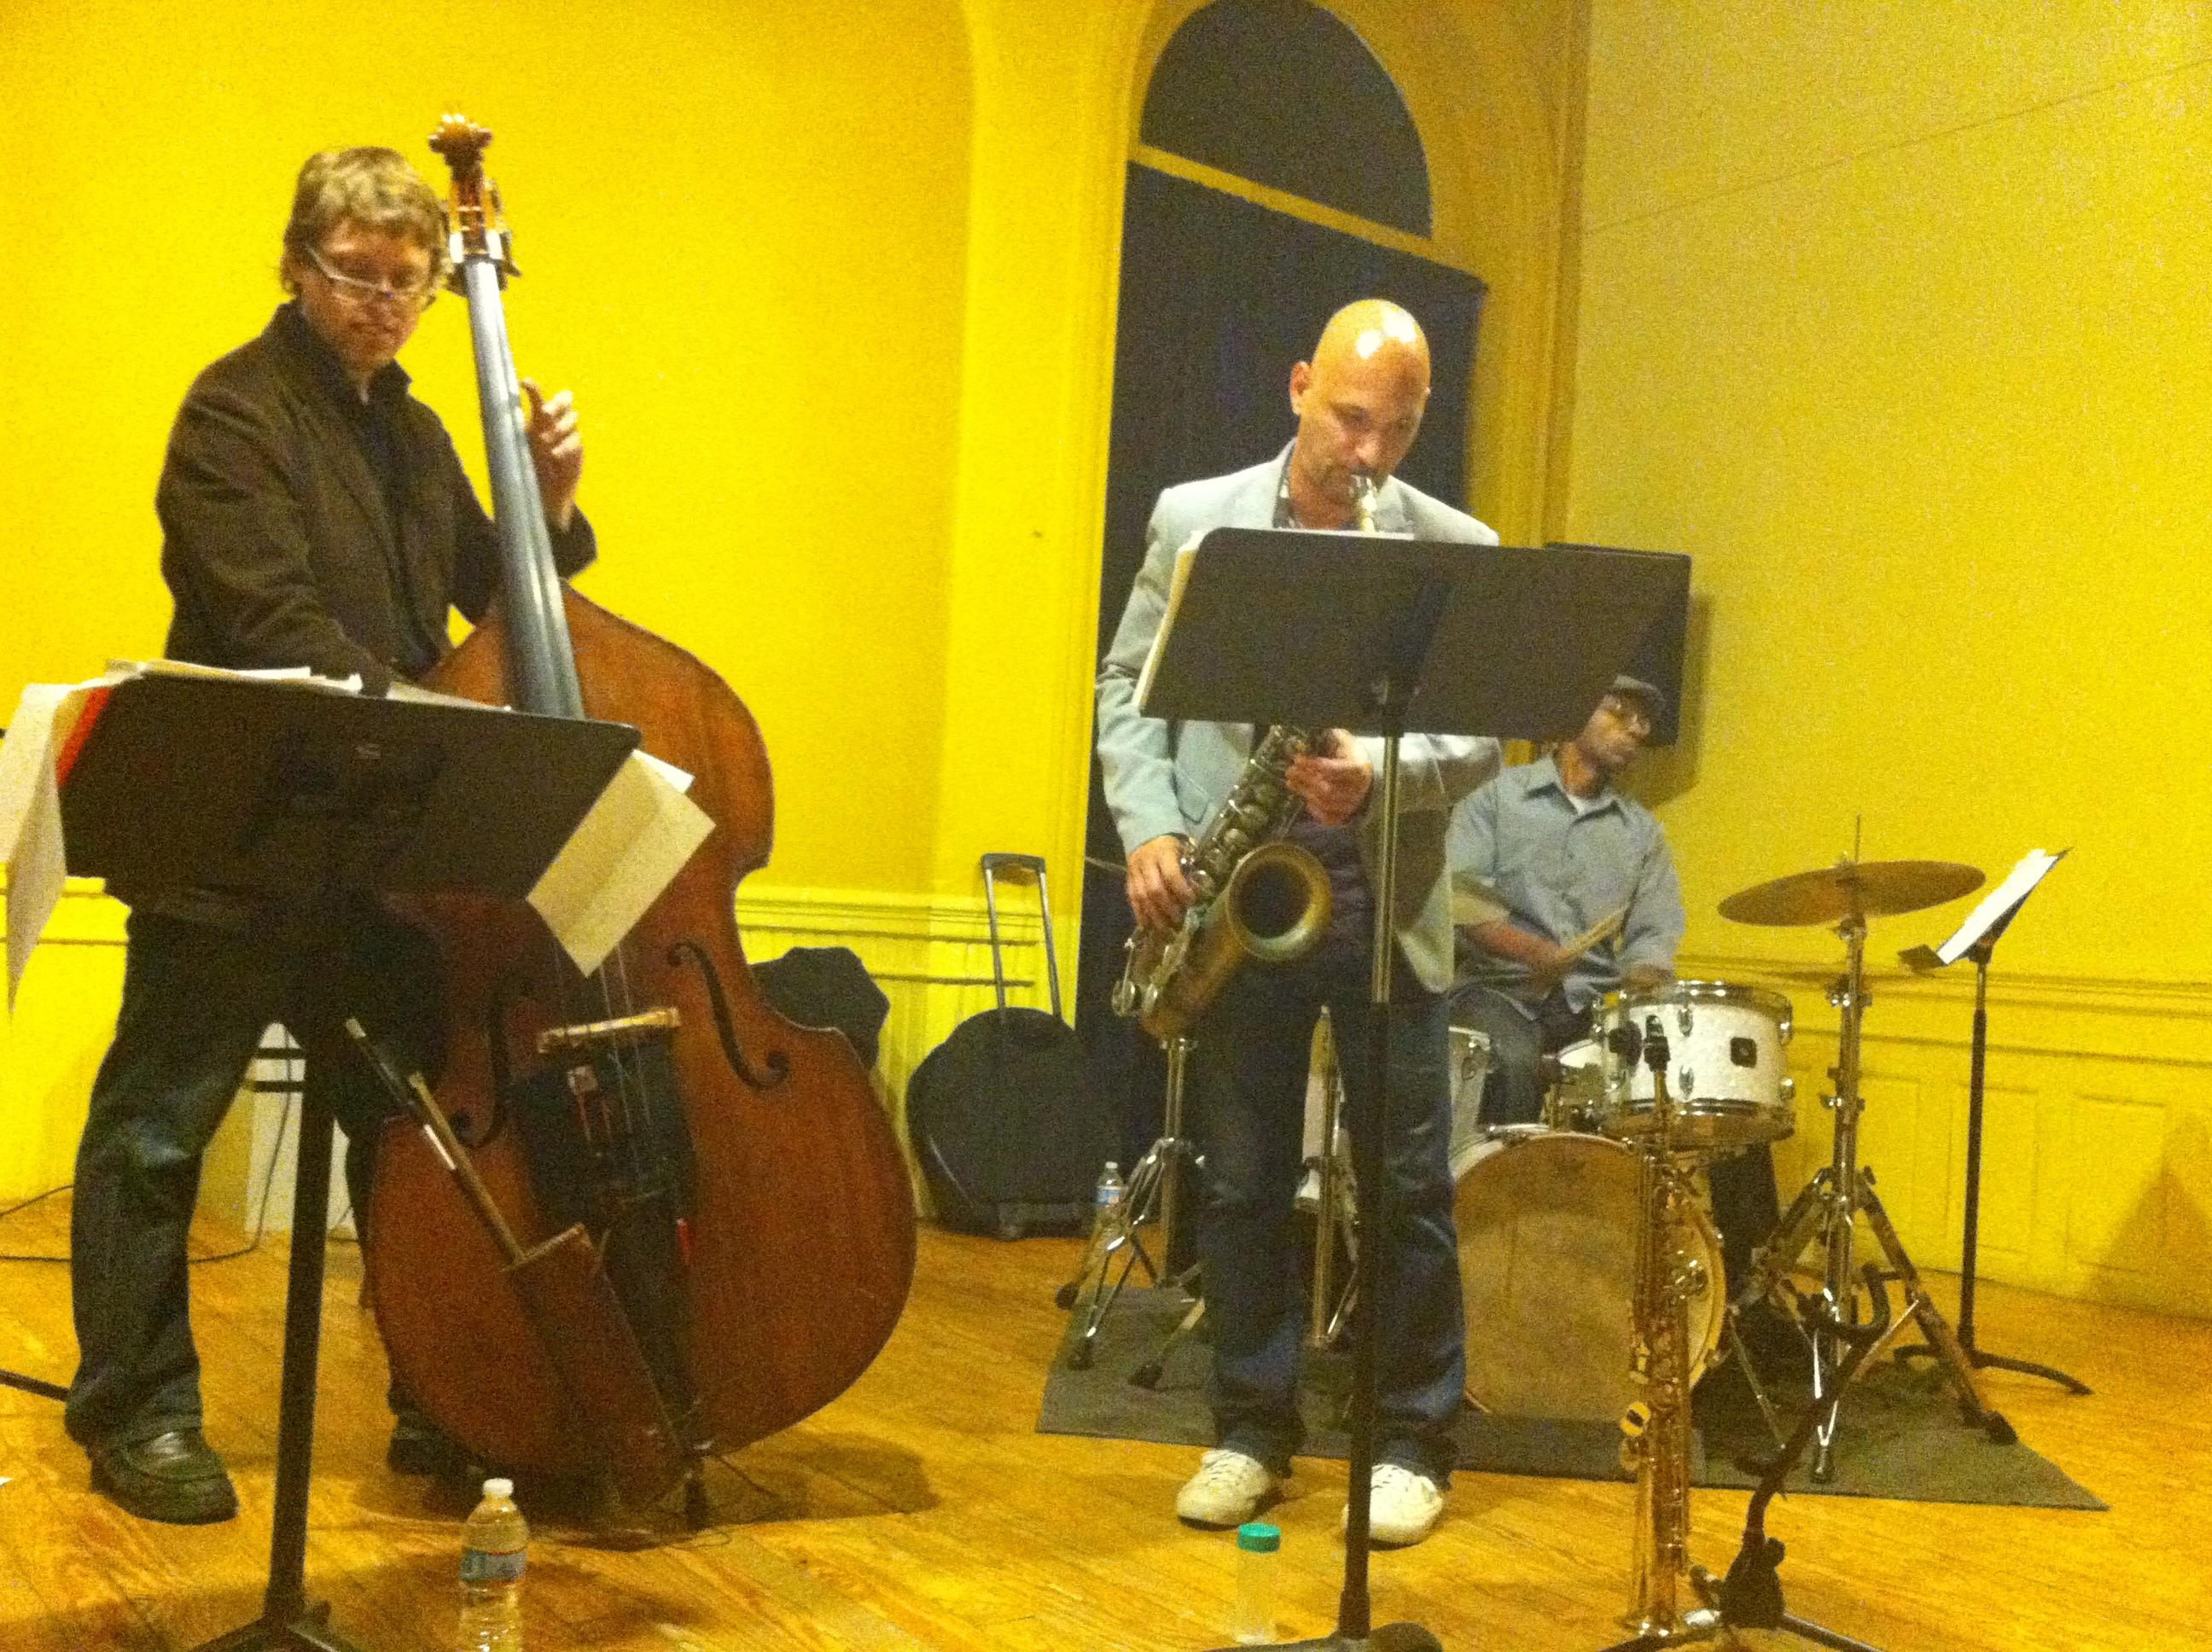 Josh Ginsburg: An Die Musik, Baltimore, January 14, 2012